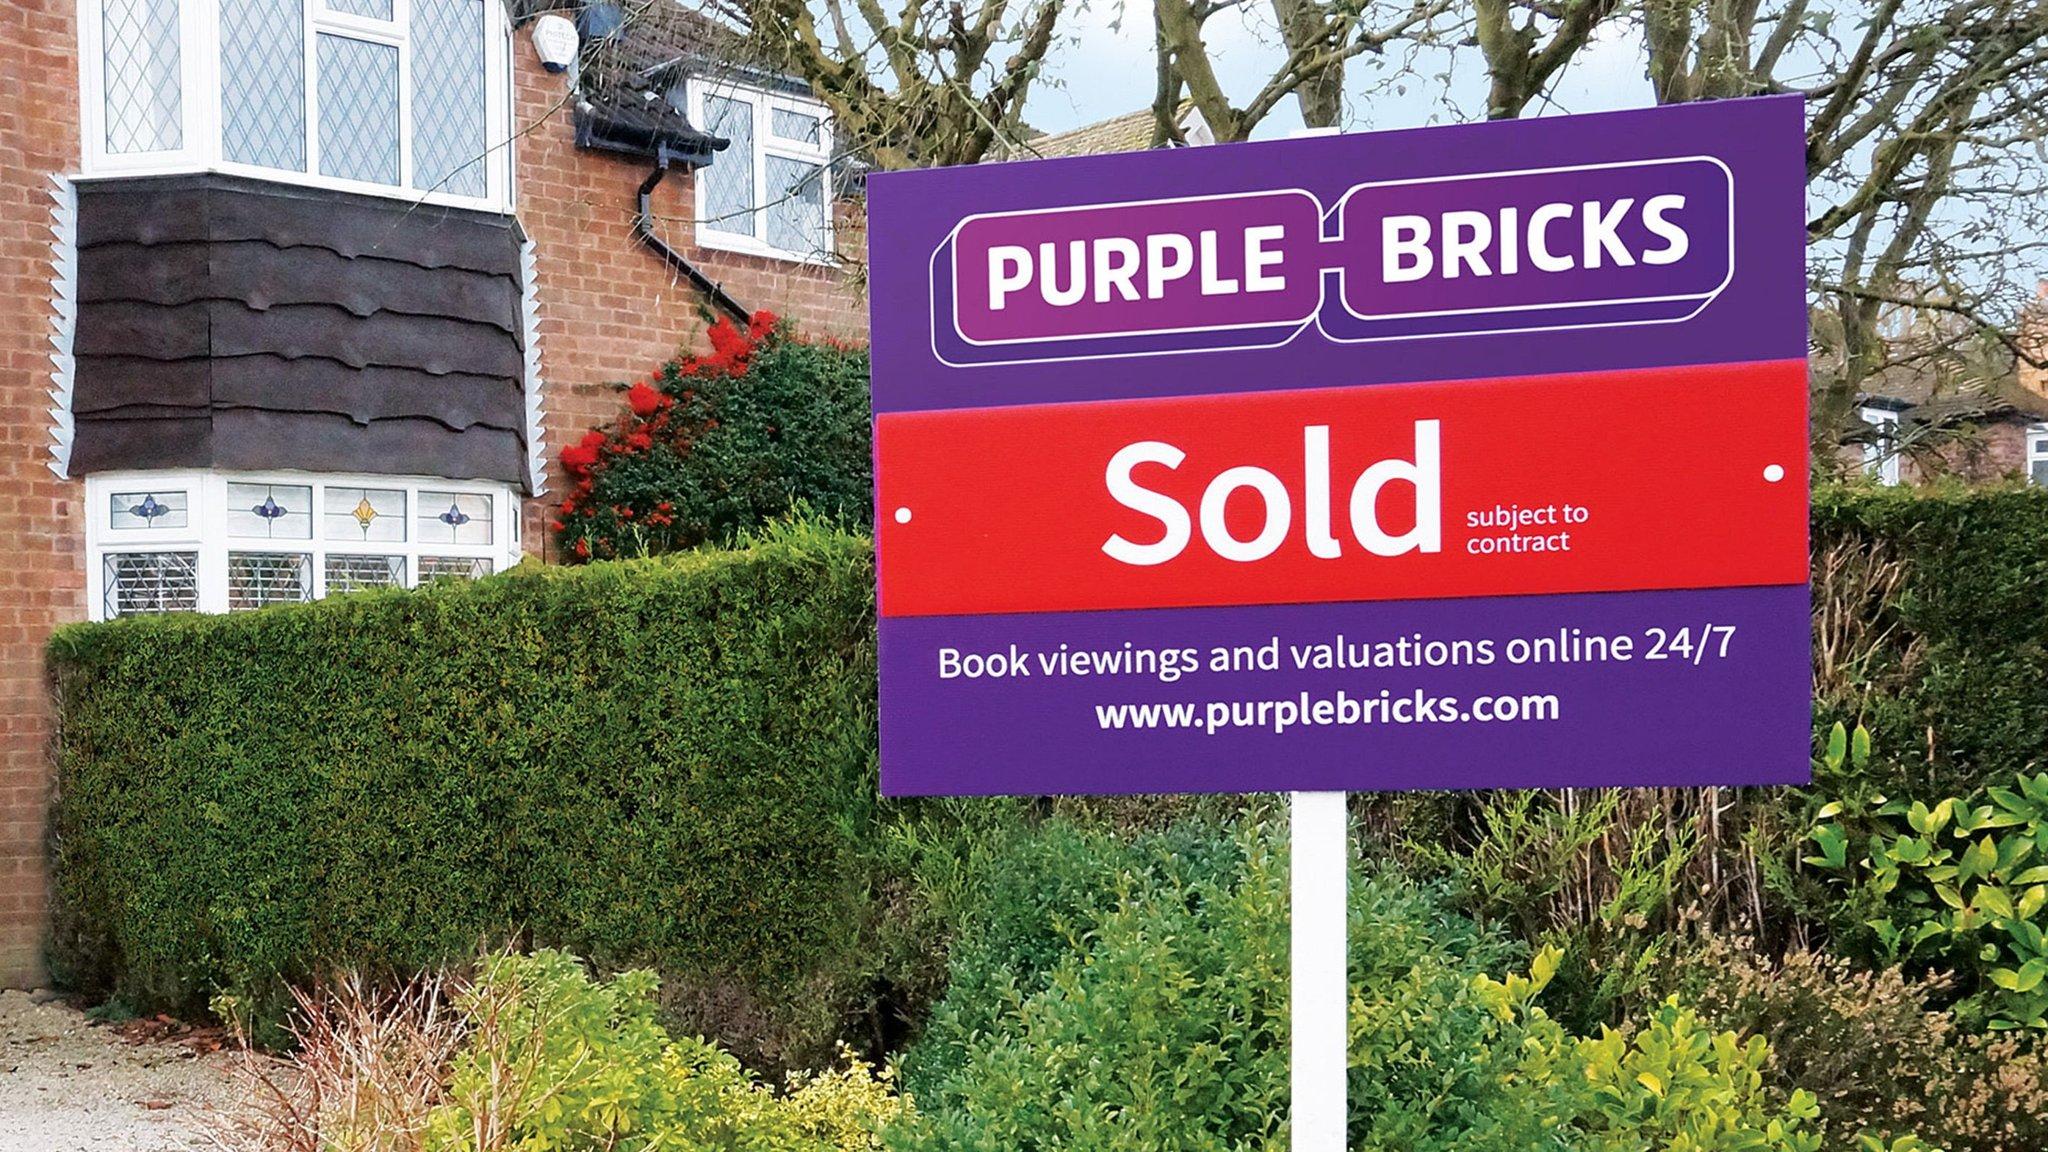 How Does Purplebricks Work >> Purplebricks Needs To Rebuild Trust As Home Sales Slow